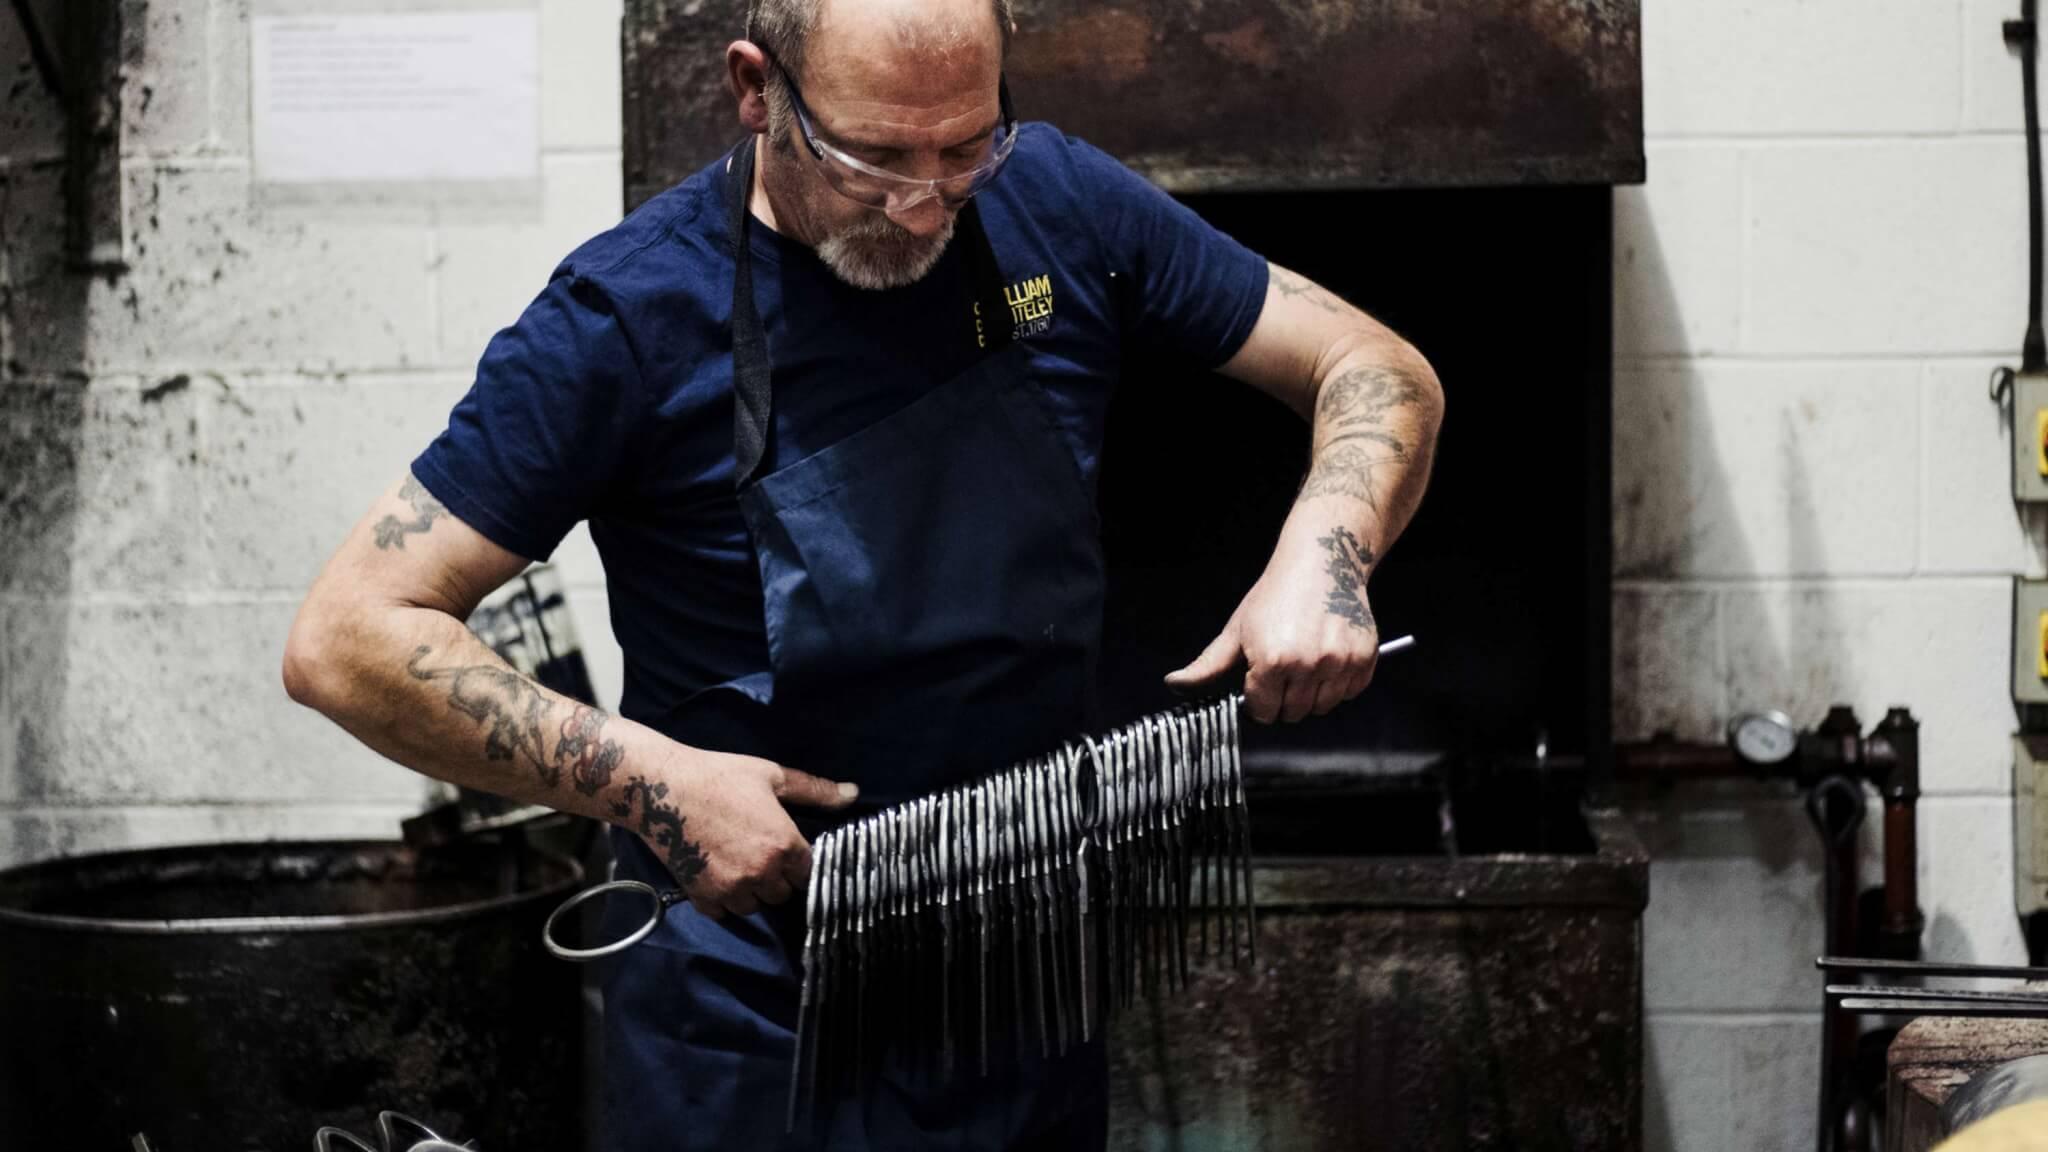 master-tailoring-shears-maker